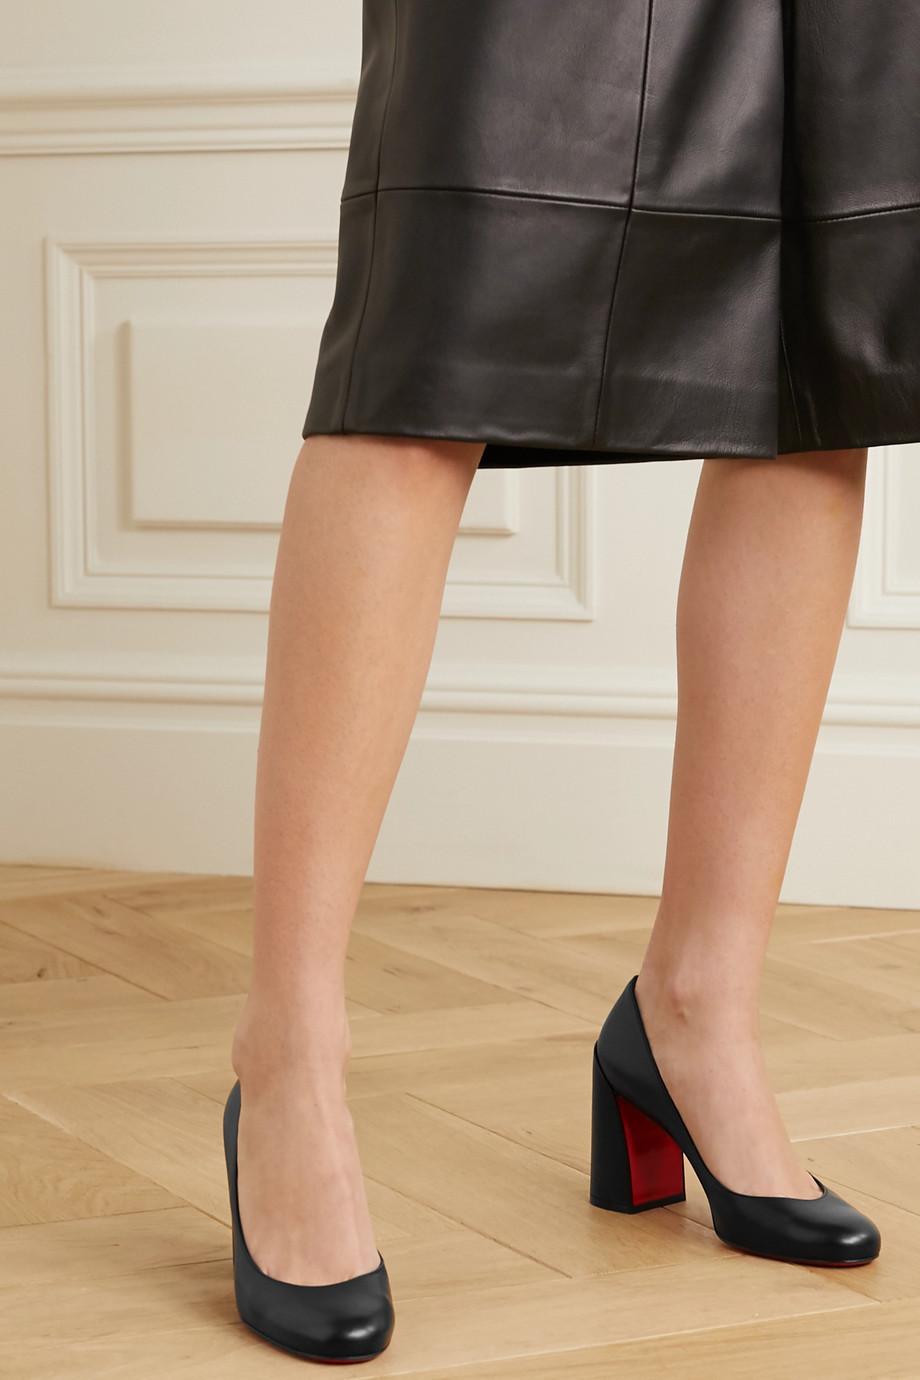 Christian Louboutin Miss Sab 85 leather pumps